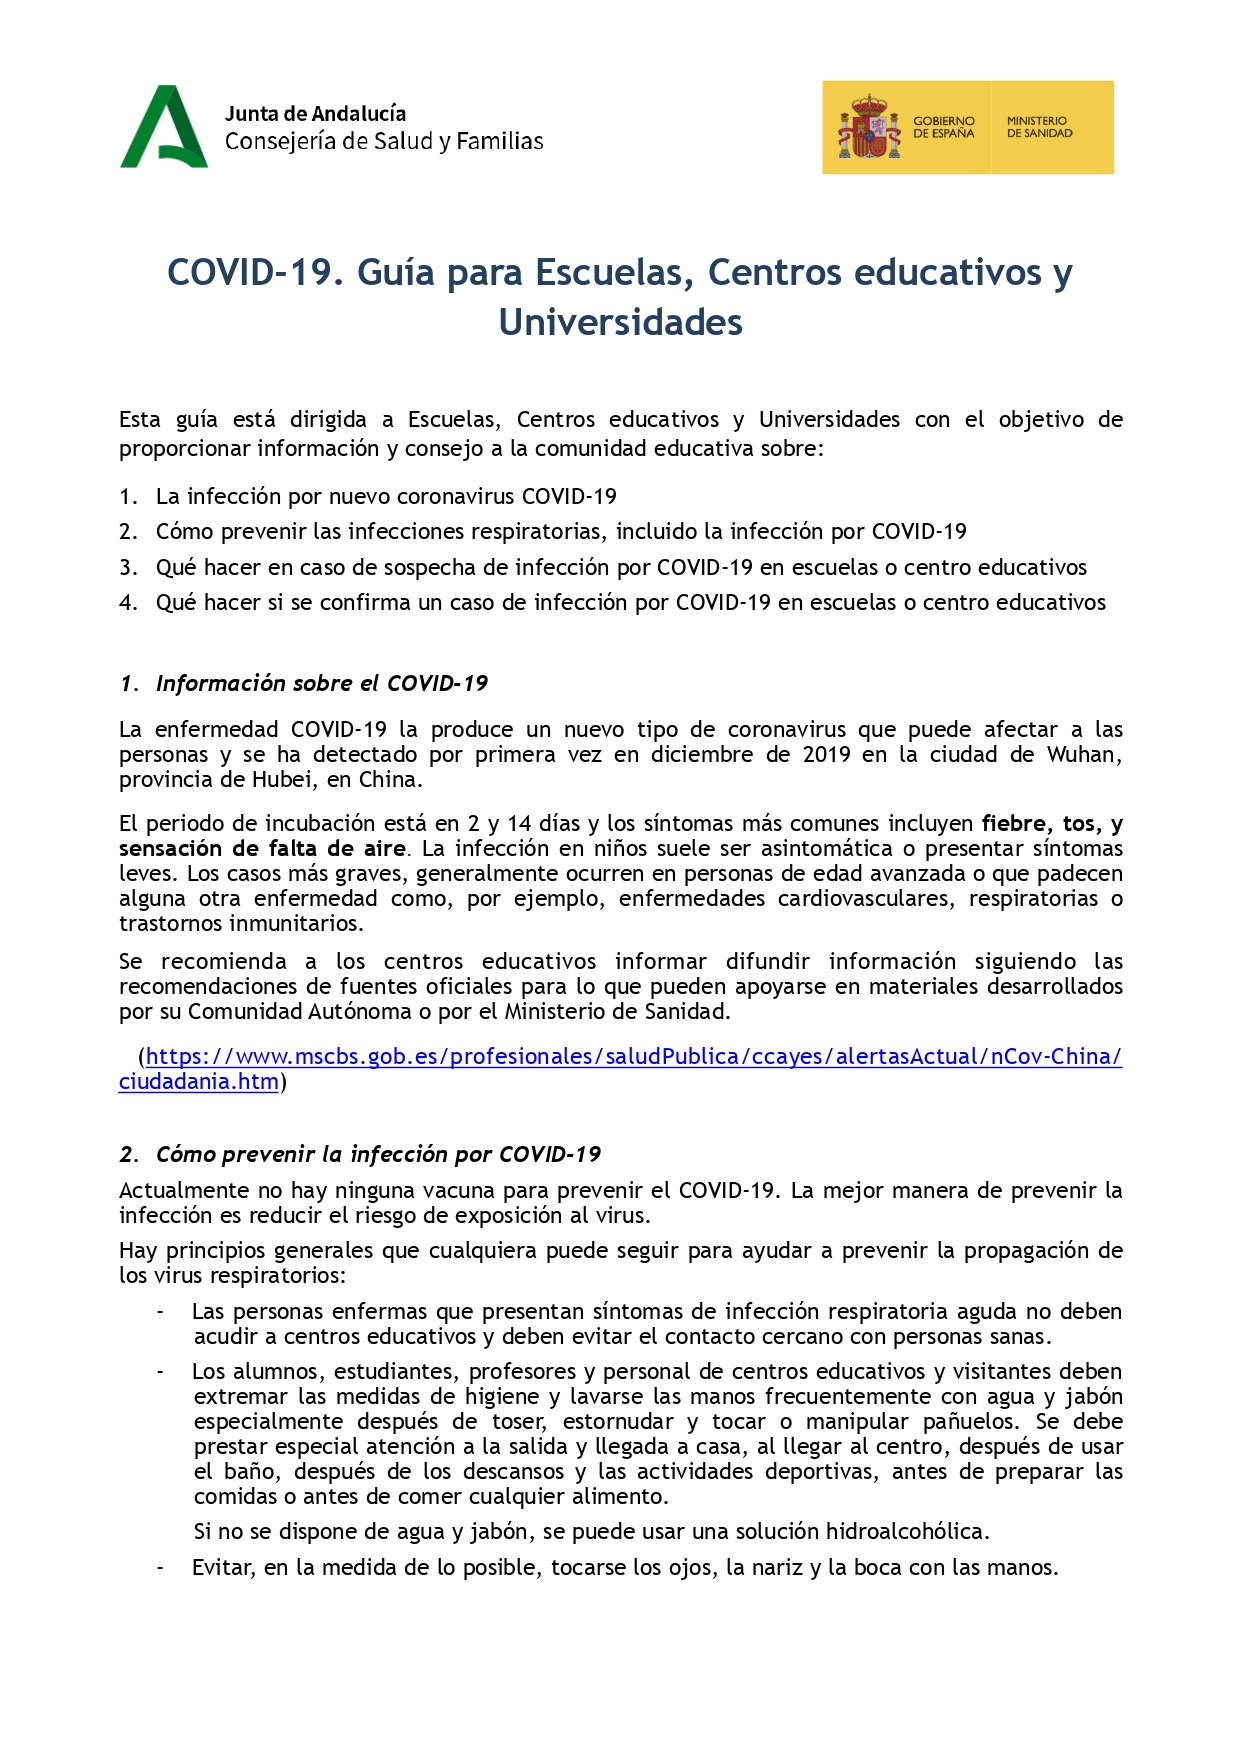 GuiaCentrosEducativosANDALUCIA_page-0001